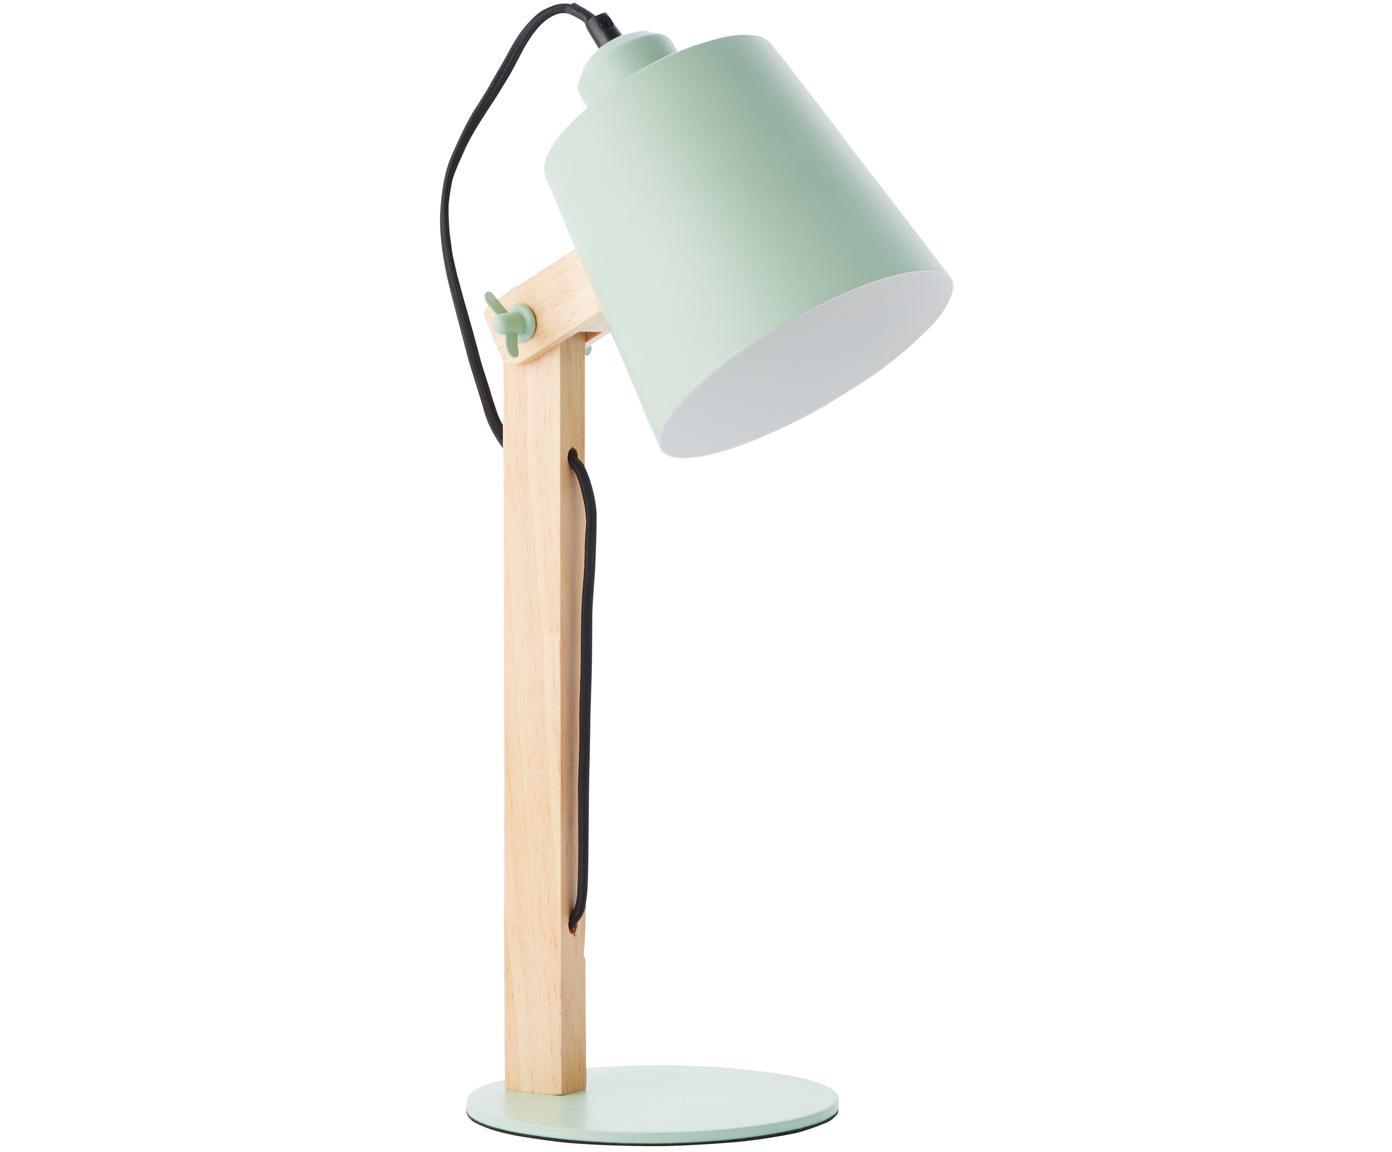 Tafellamp Swivel, Metaal, hout, Mintgroen, hout, 16 x 52 cm